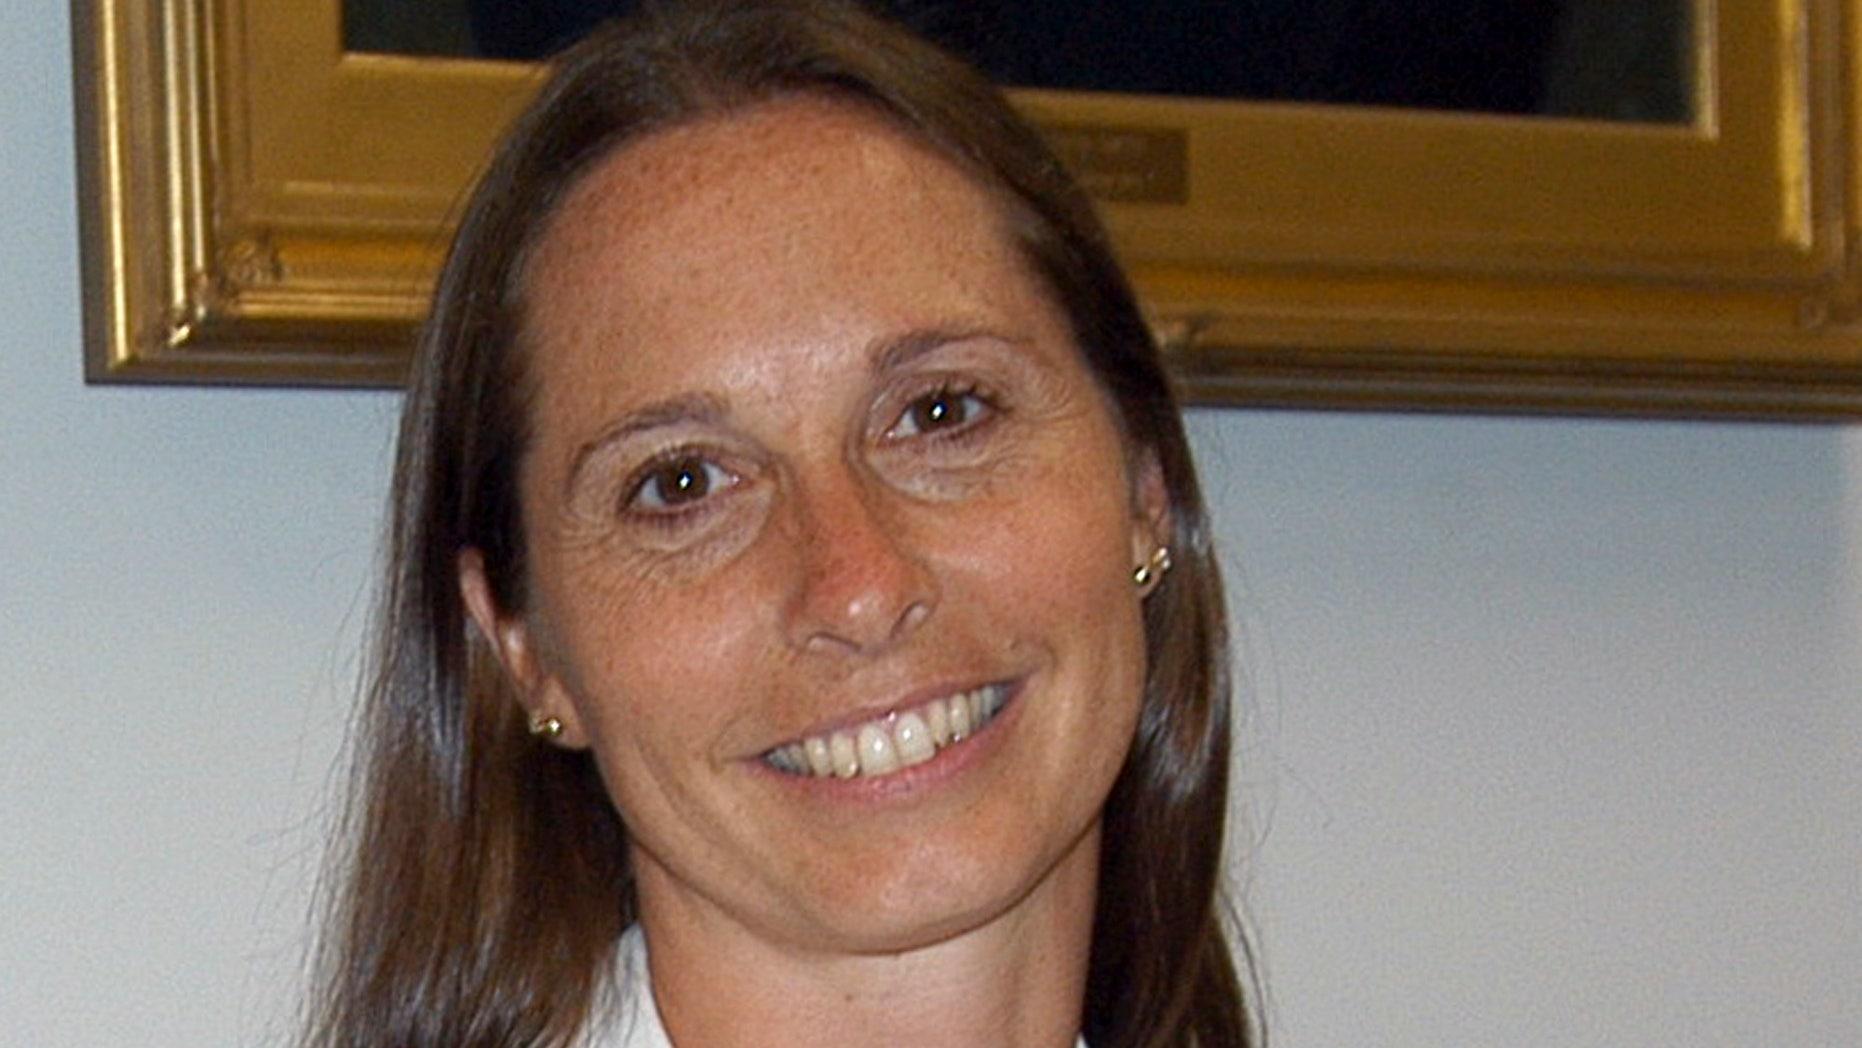 July 2010: File photo of Dawn Lafferty Hochsprung, principal at Sandy Hook Elementary School, in Newtown, Conn.